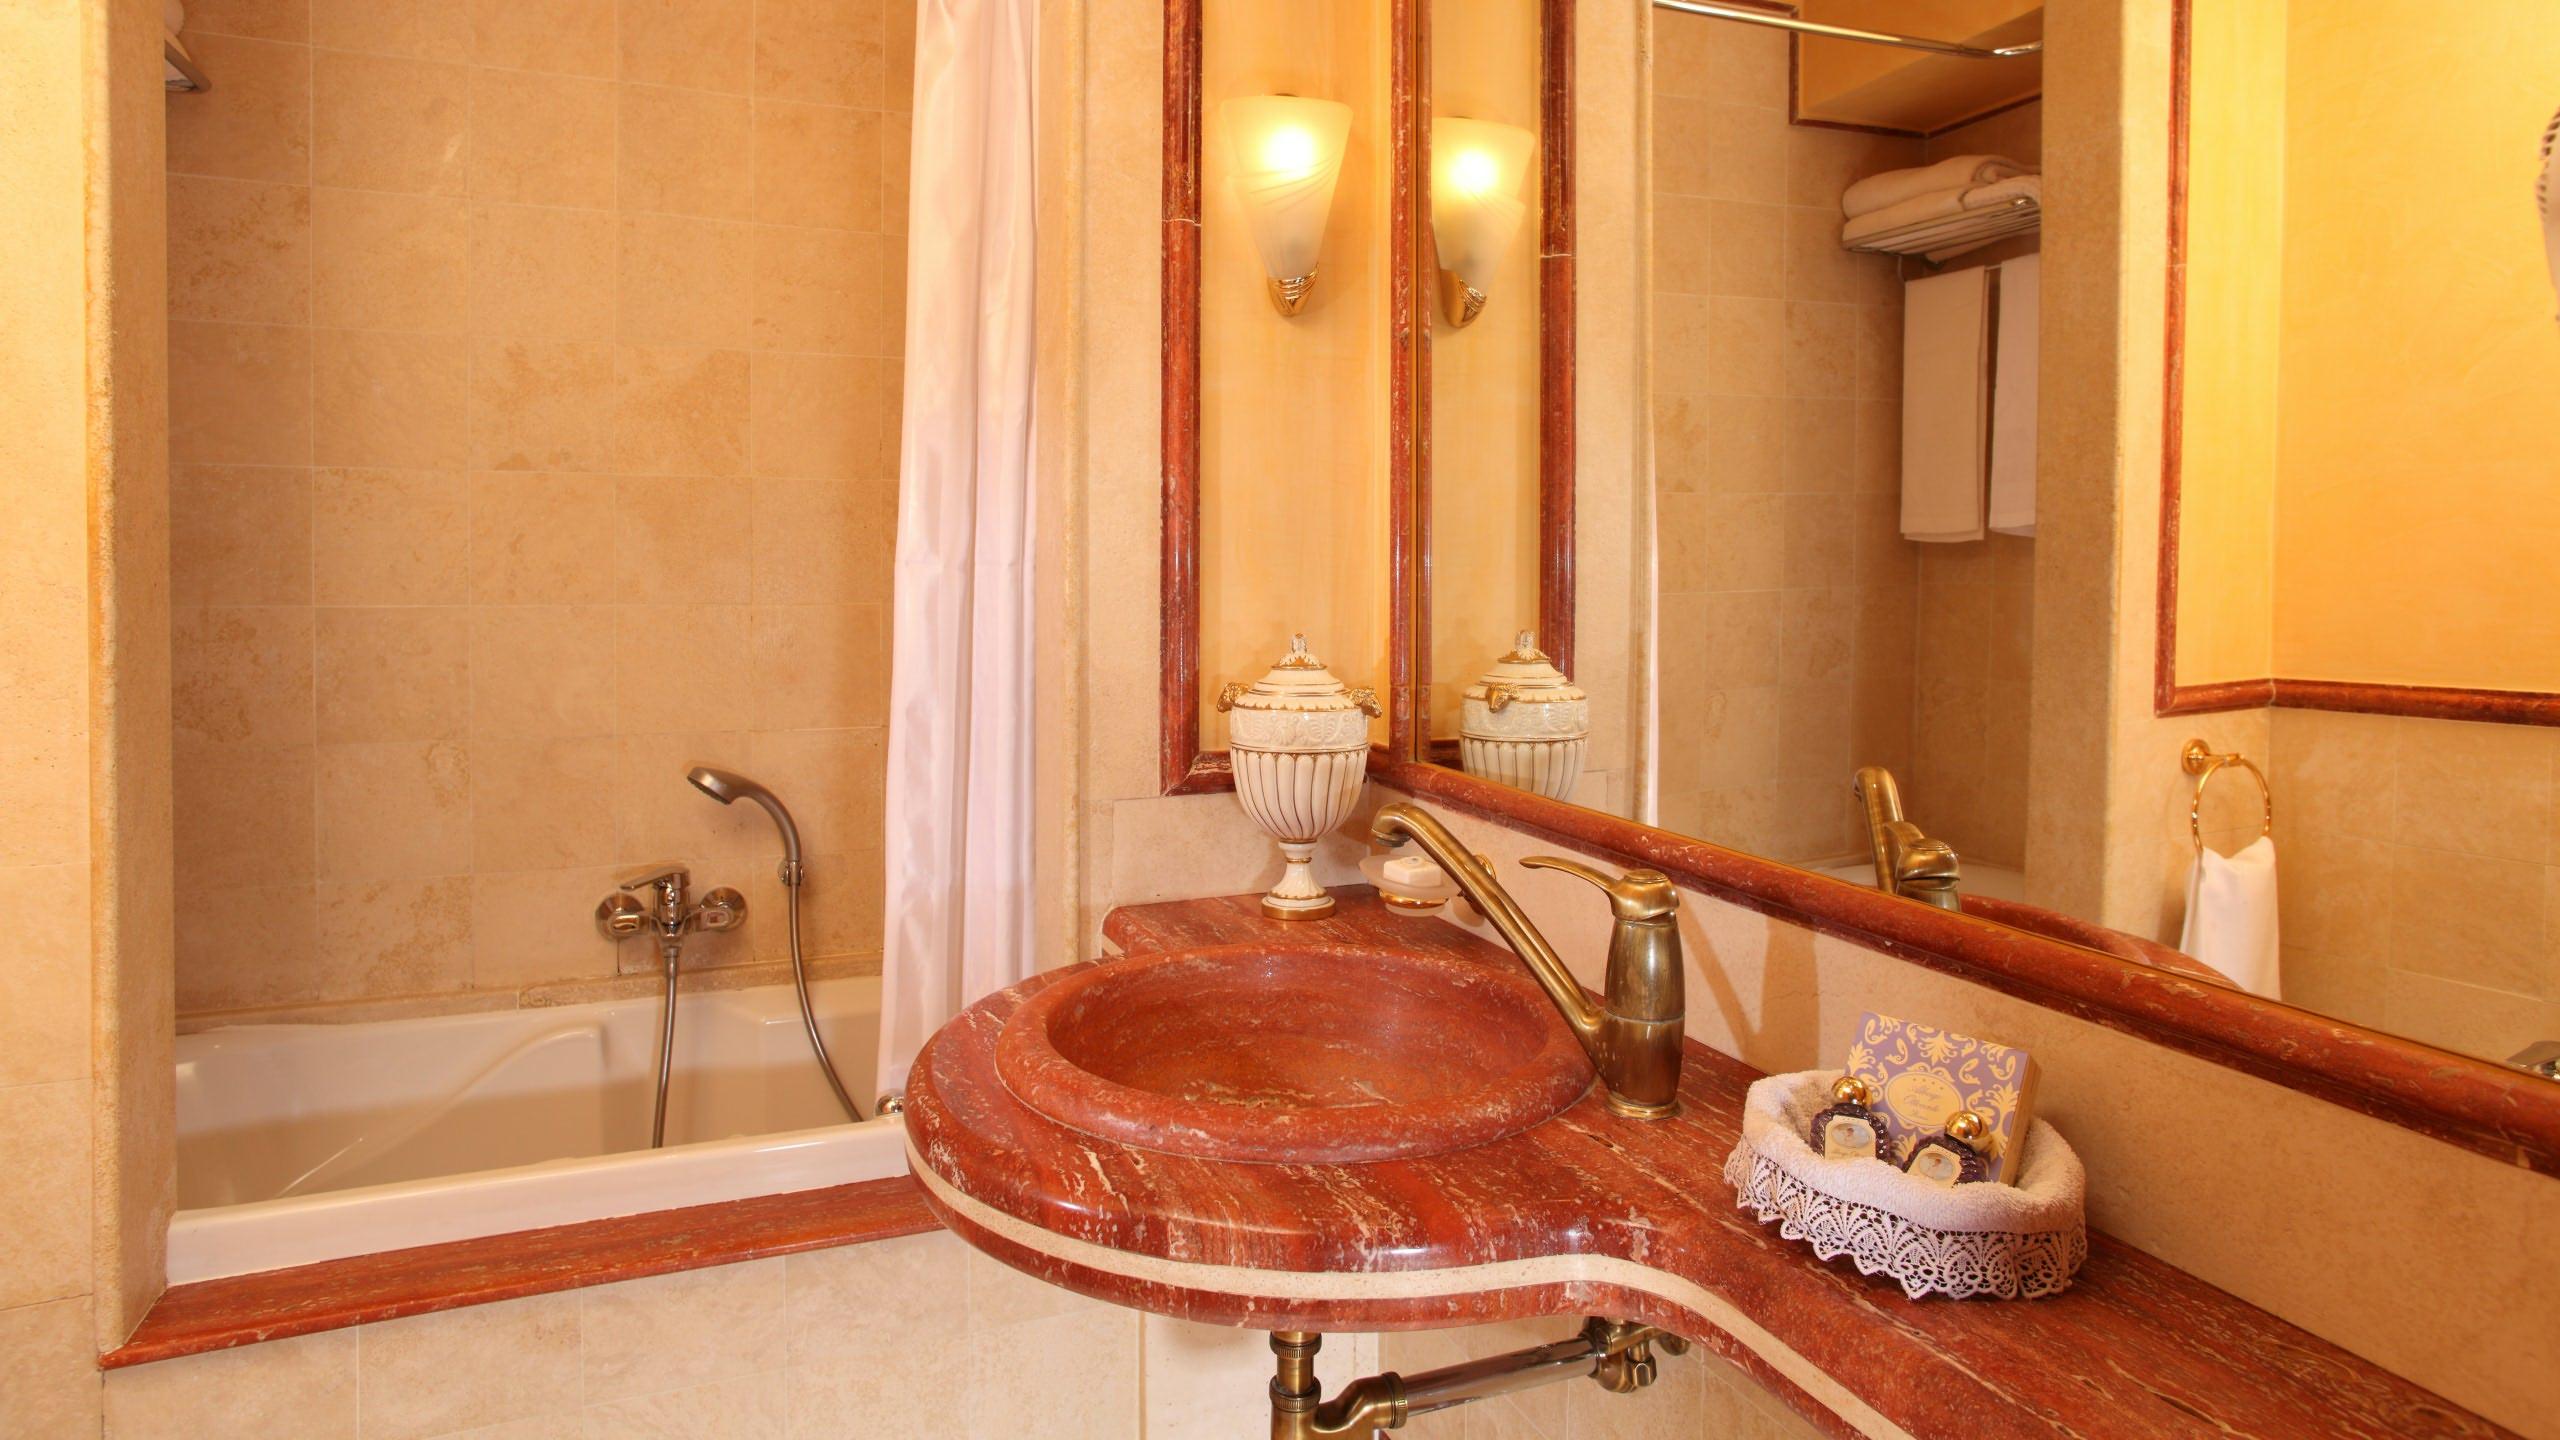 albergo-ottocento-rome-bathroom-19